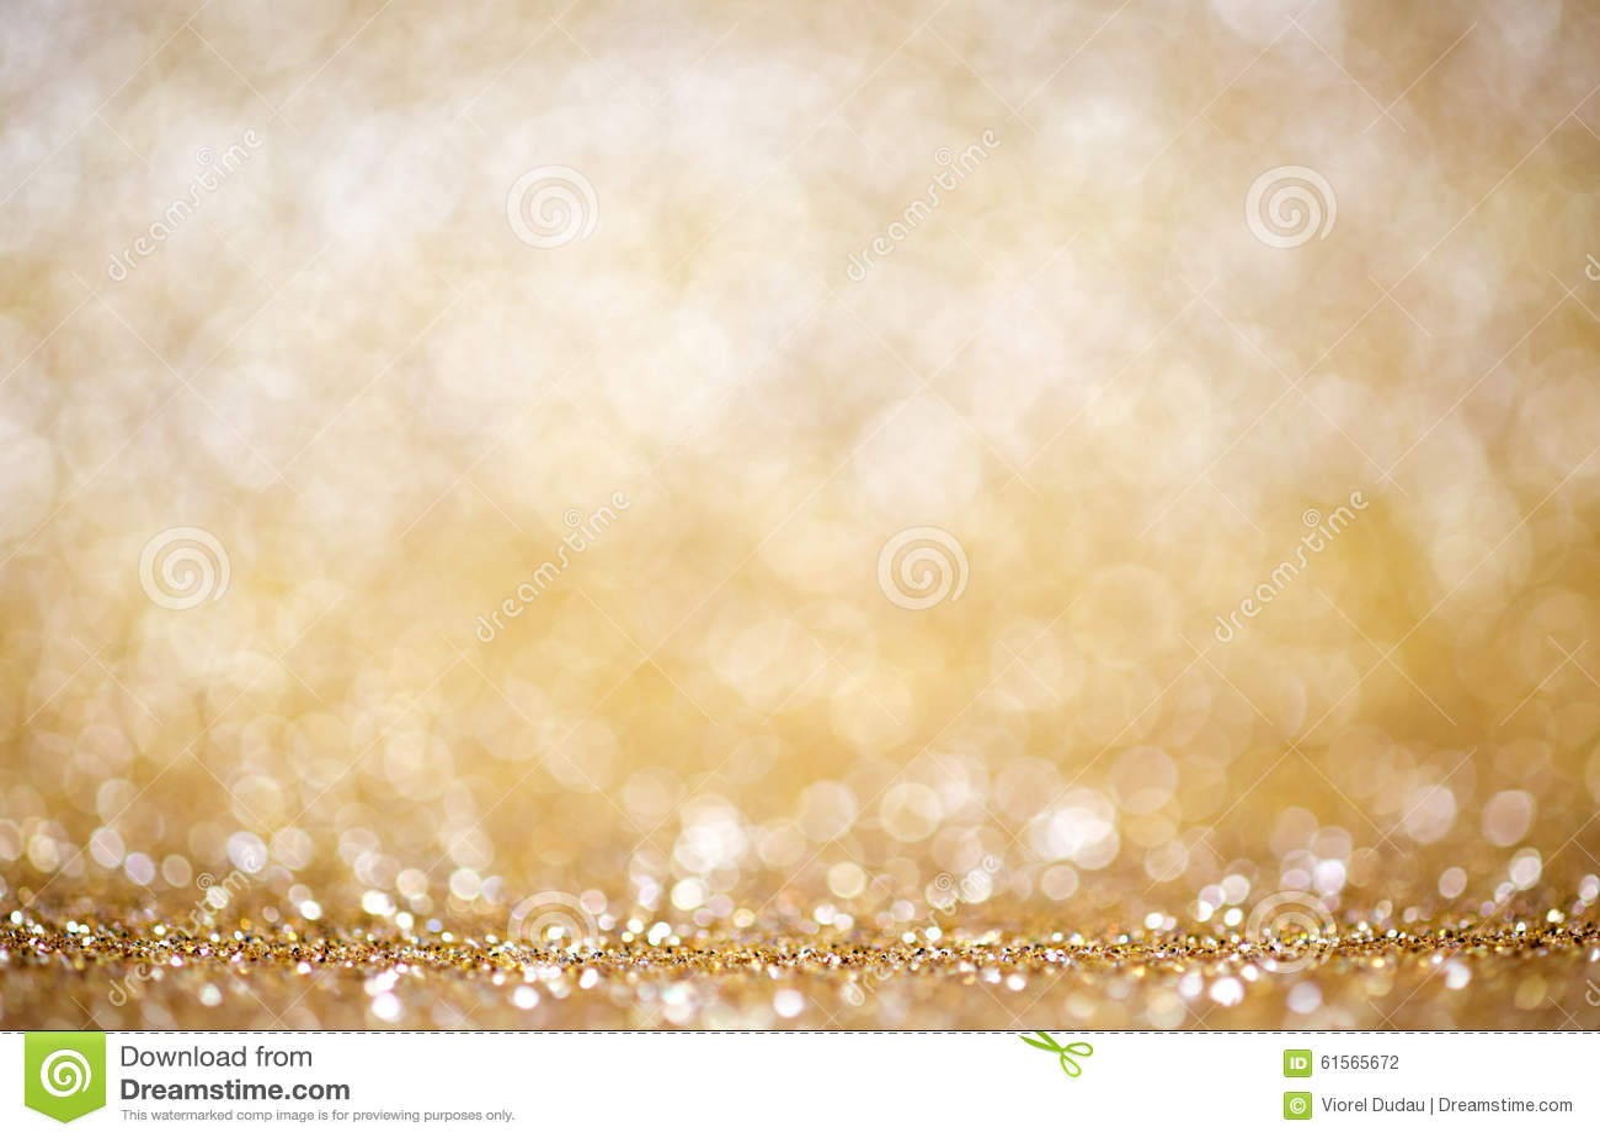 Glitter Christmas background